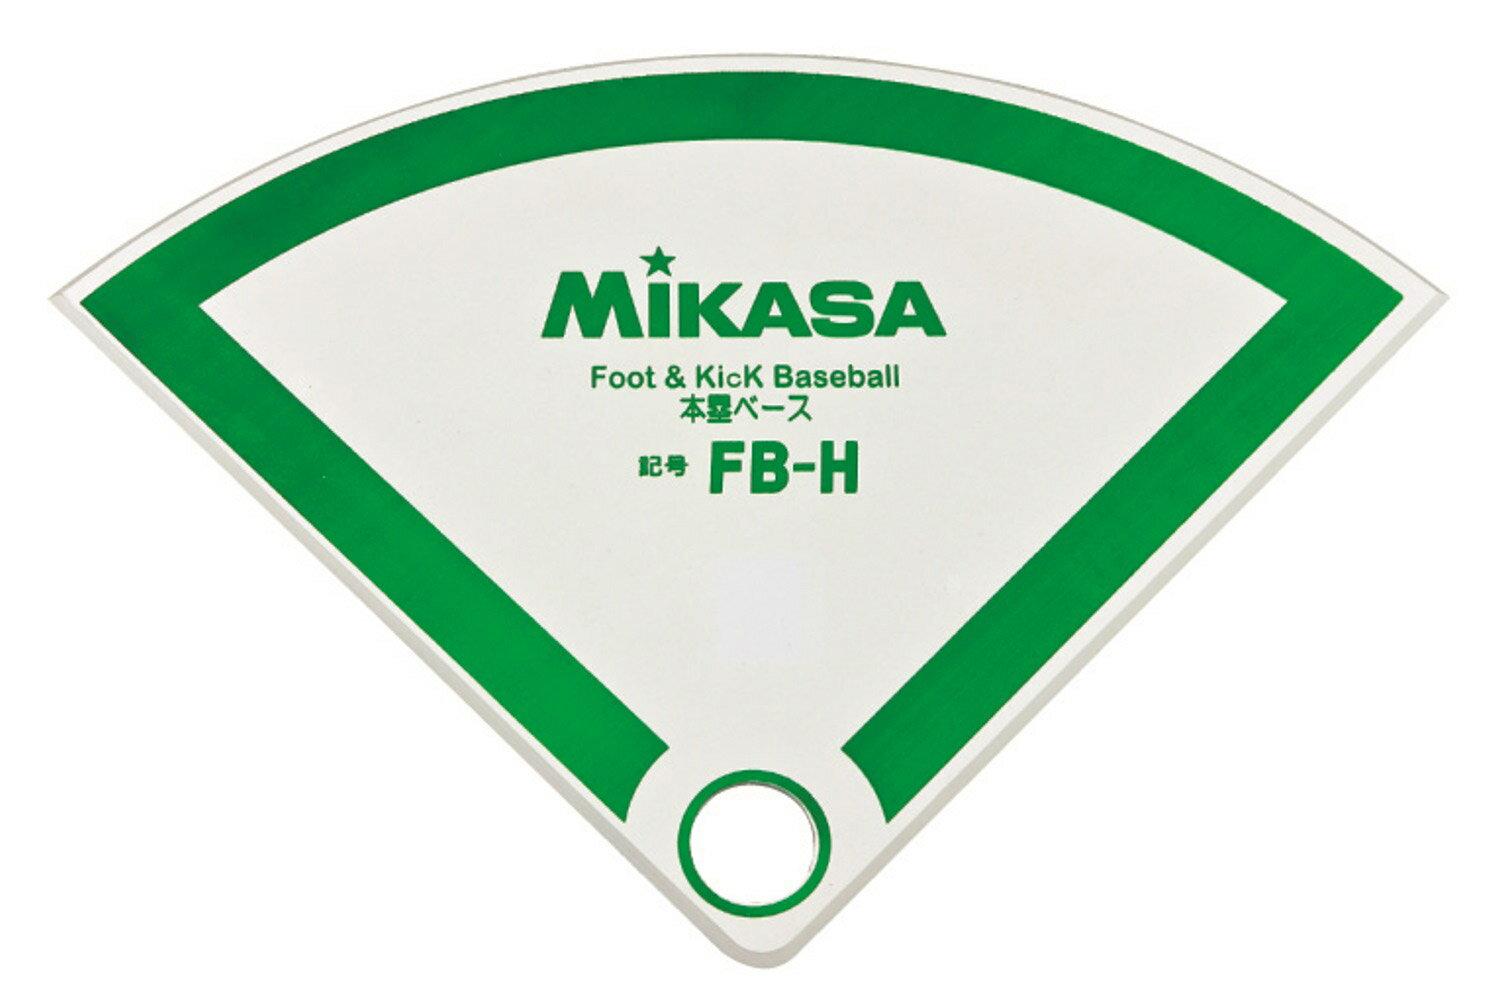 【MIKASA】ミカサ フットベースボール用ホームベースfb-h 02P03Sep16